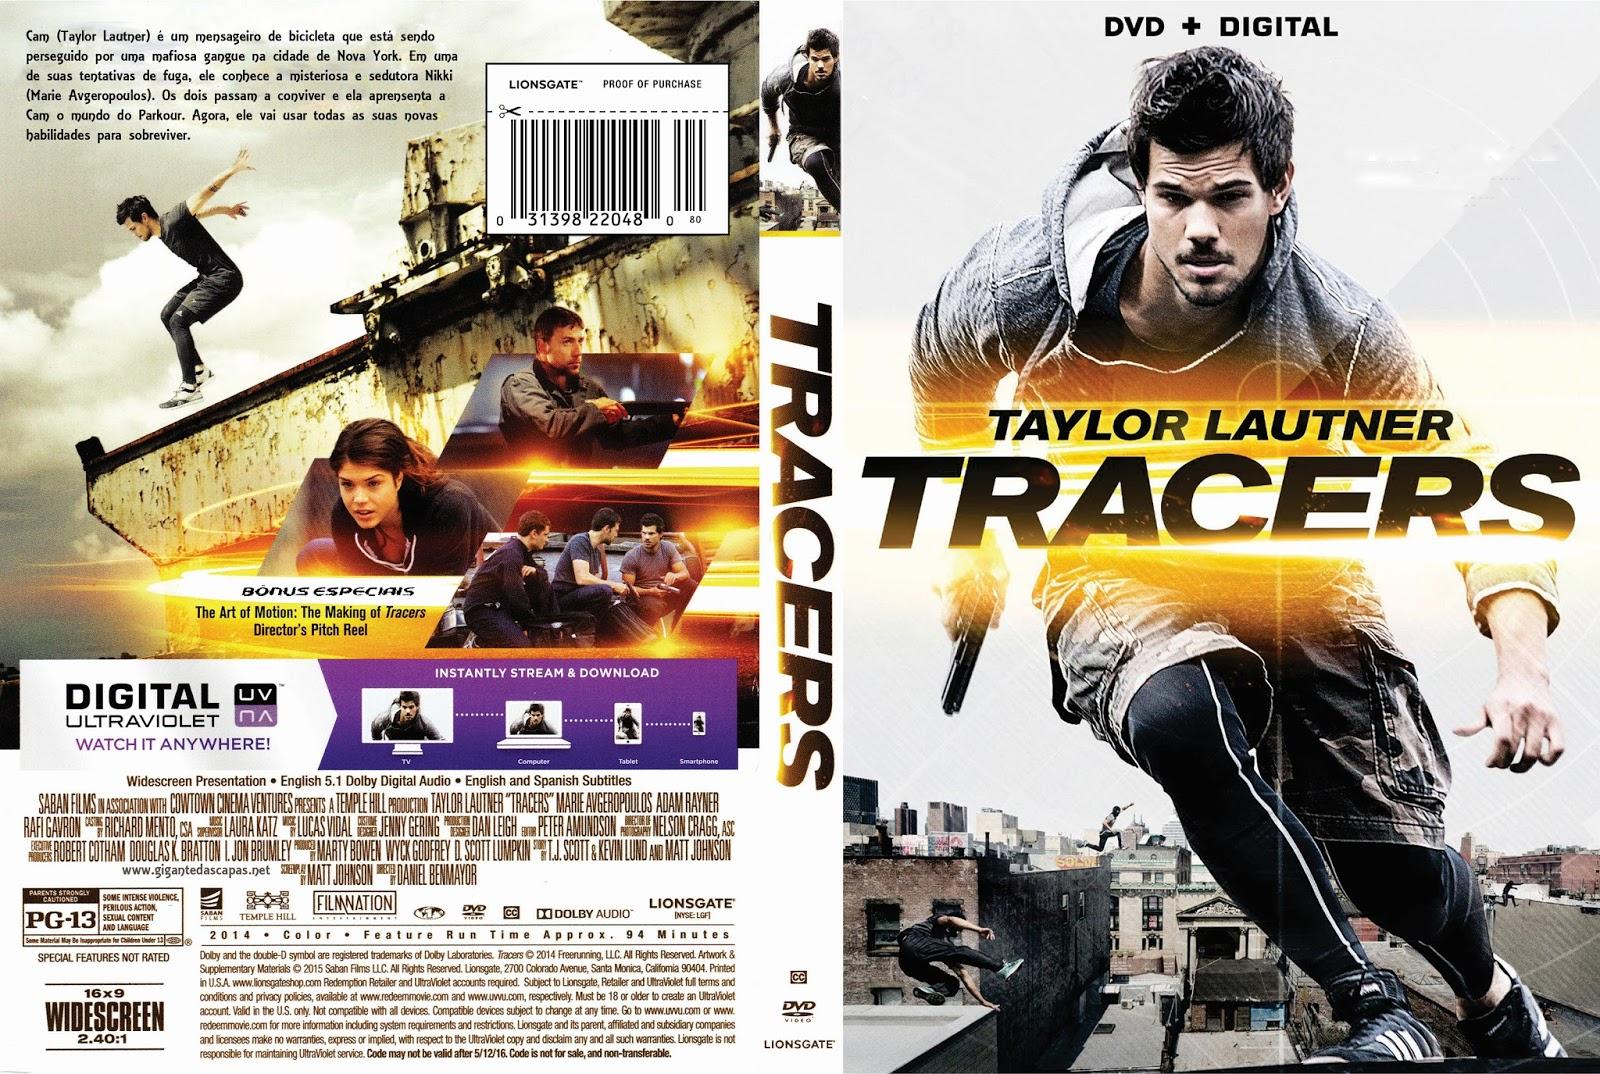 Download Tracers BDRip XviD Dual Áudio Tracers 2B  2BCapa 2BFilme 2BDVD